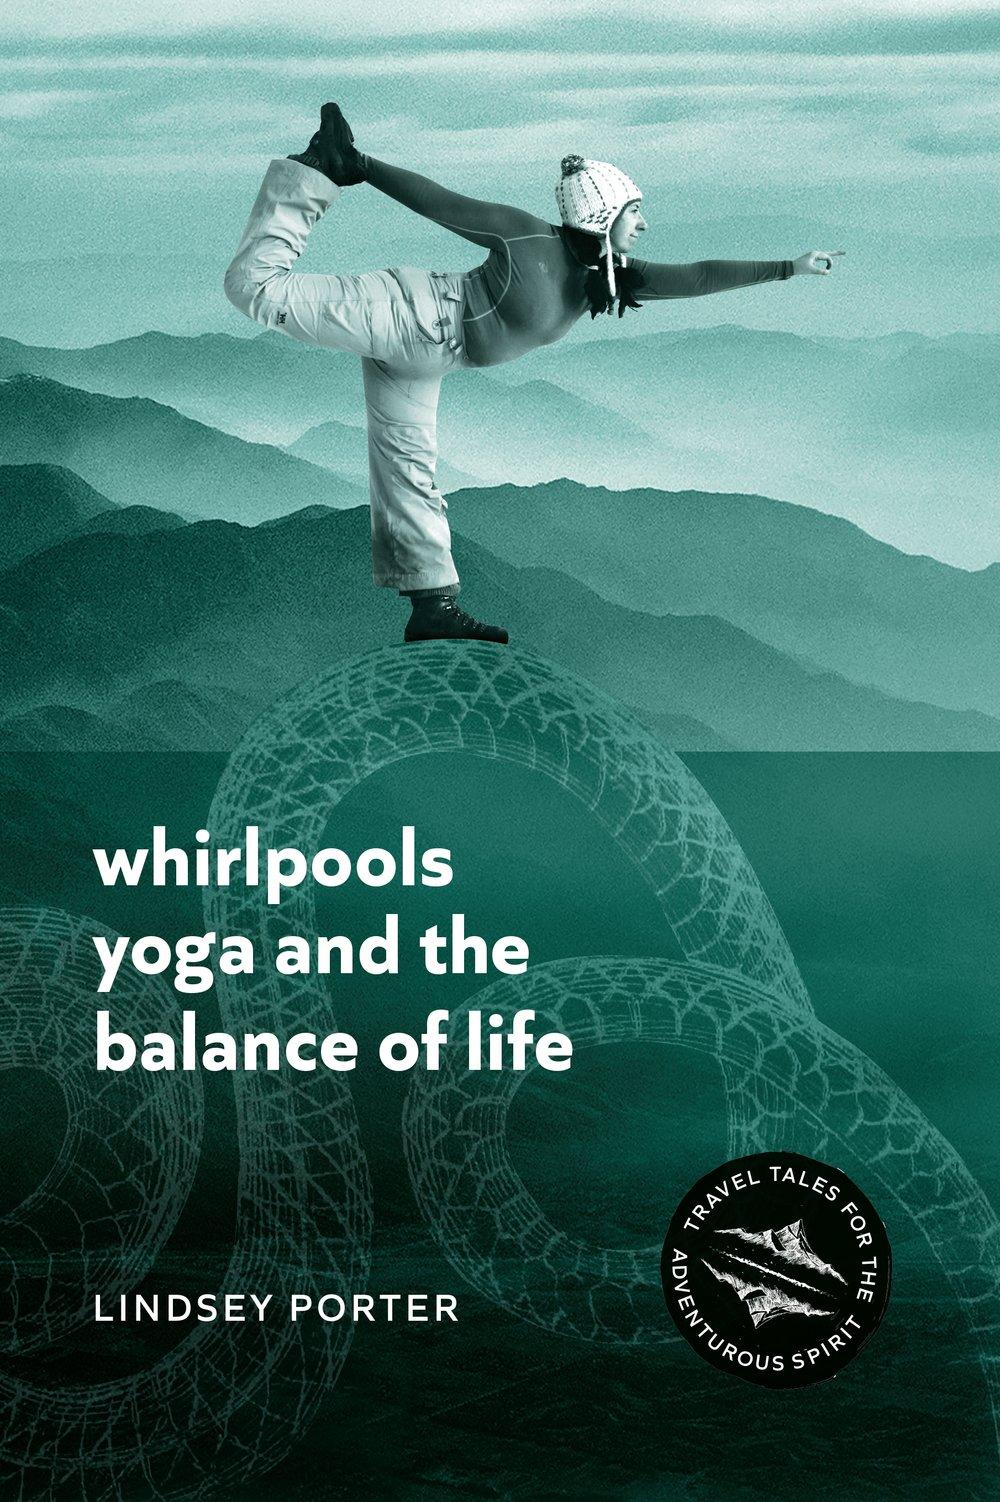 Lindsey Porter Book Cover